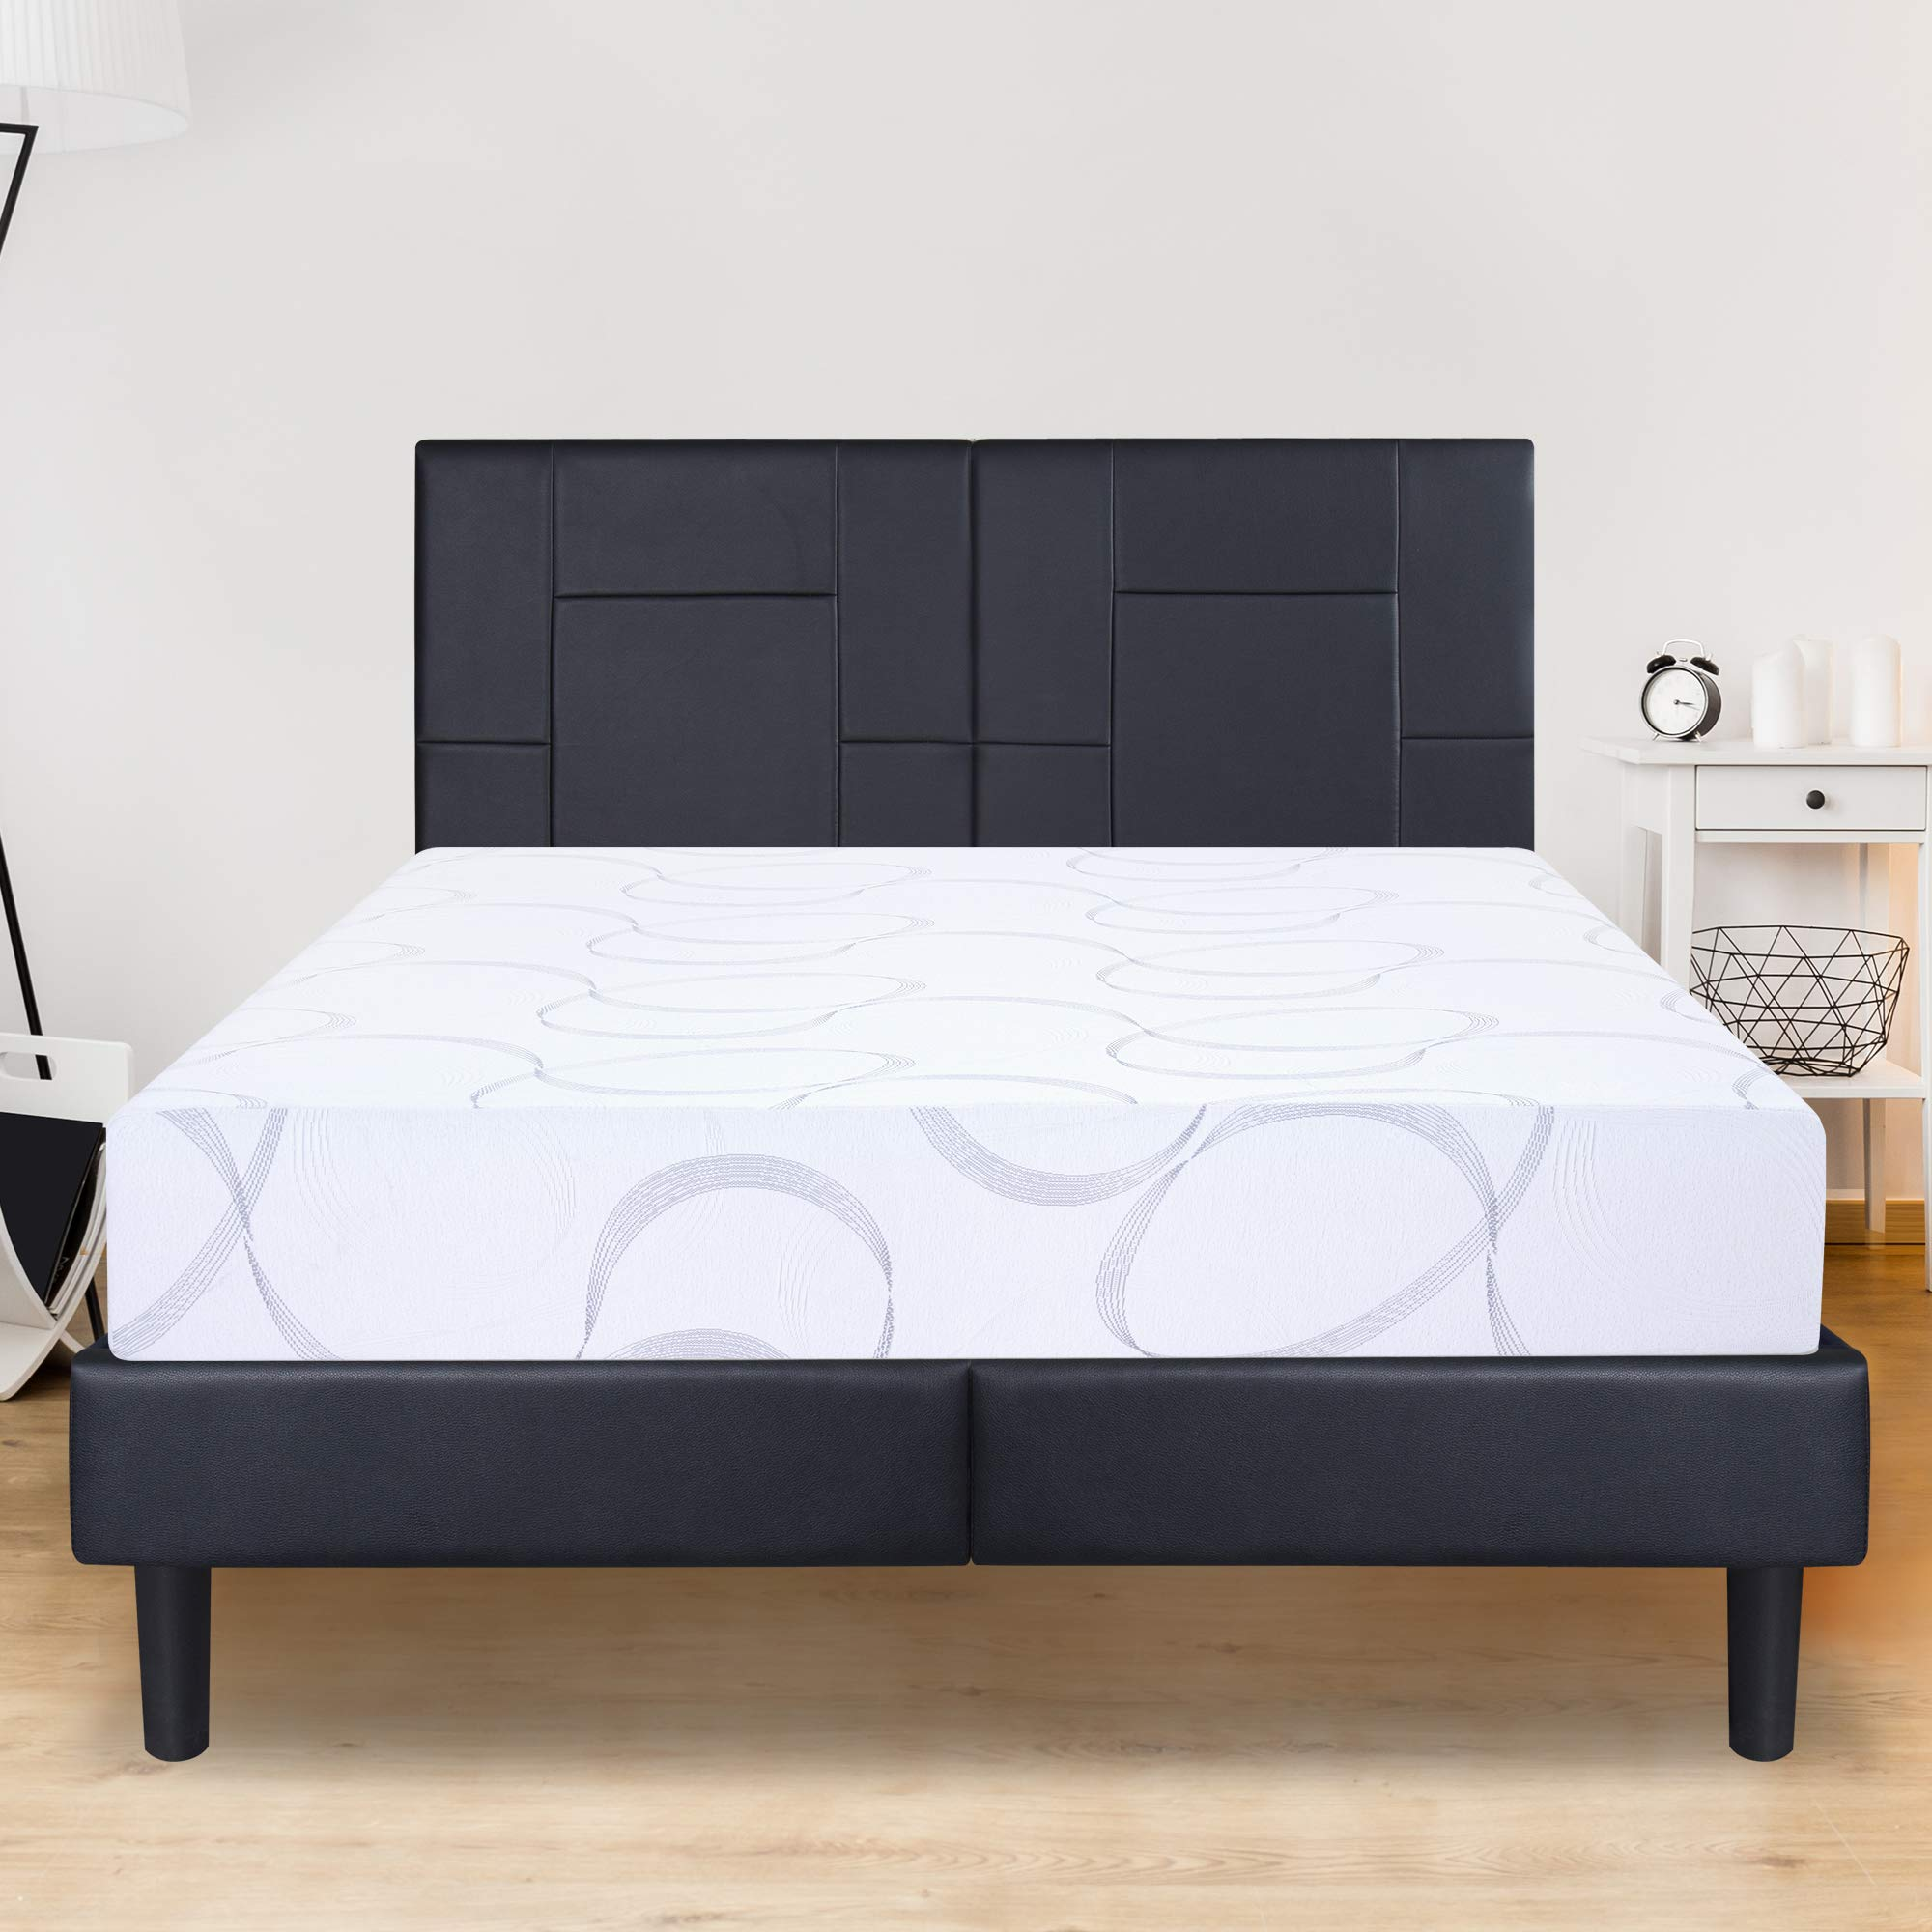 Olee Sleep Multi-Layered I-Gel Infused Memory Foam Mattress, Full, White by Olee Sleep